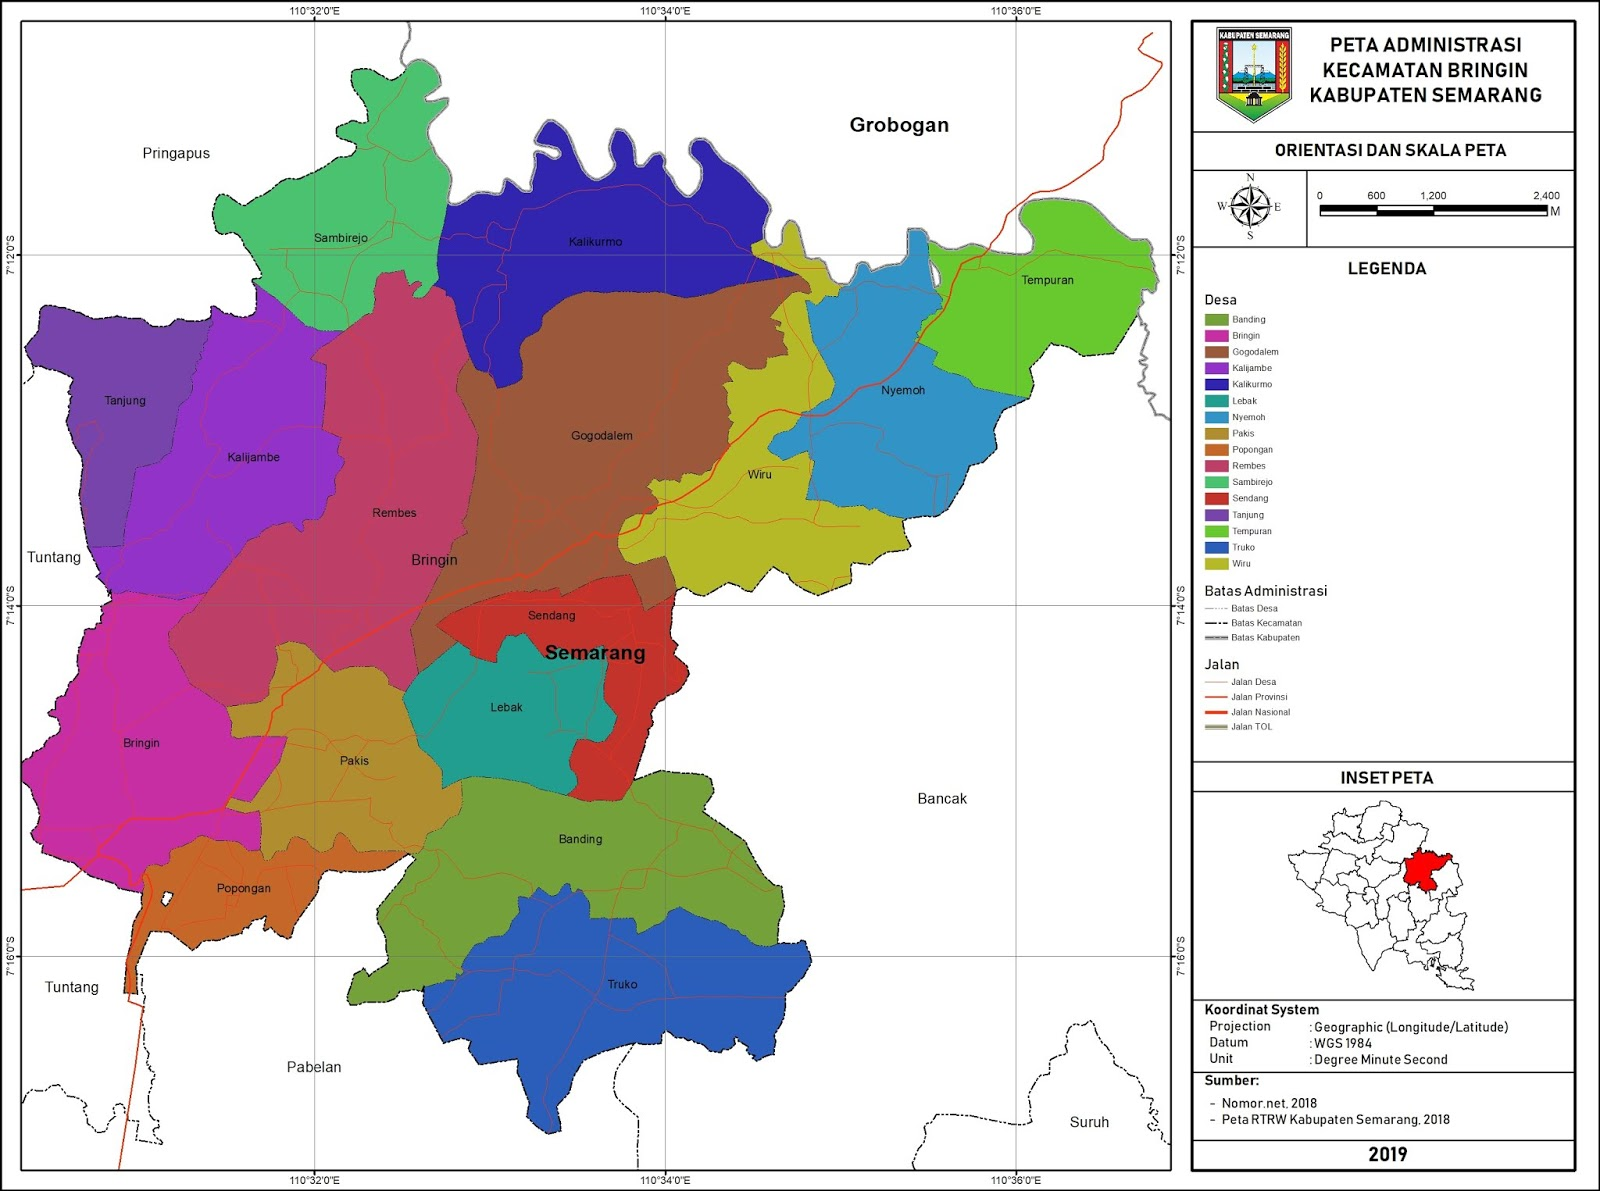 Peta Administrasi Kecamatan Bringin, Kabupaten Semarang ...